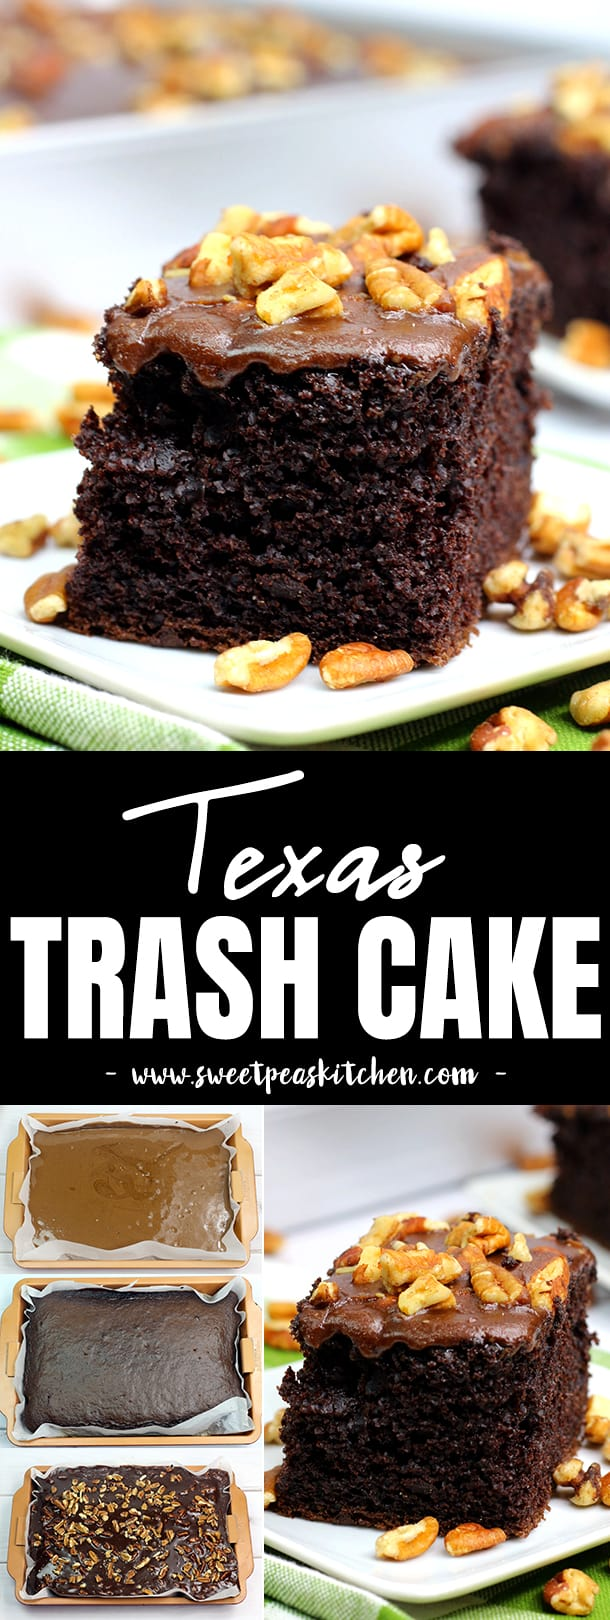 Texas Trash Buttermilk Chocolate Cake Recipe with Pecans